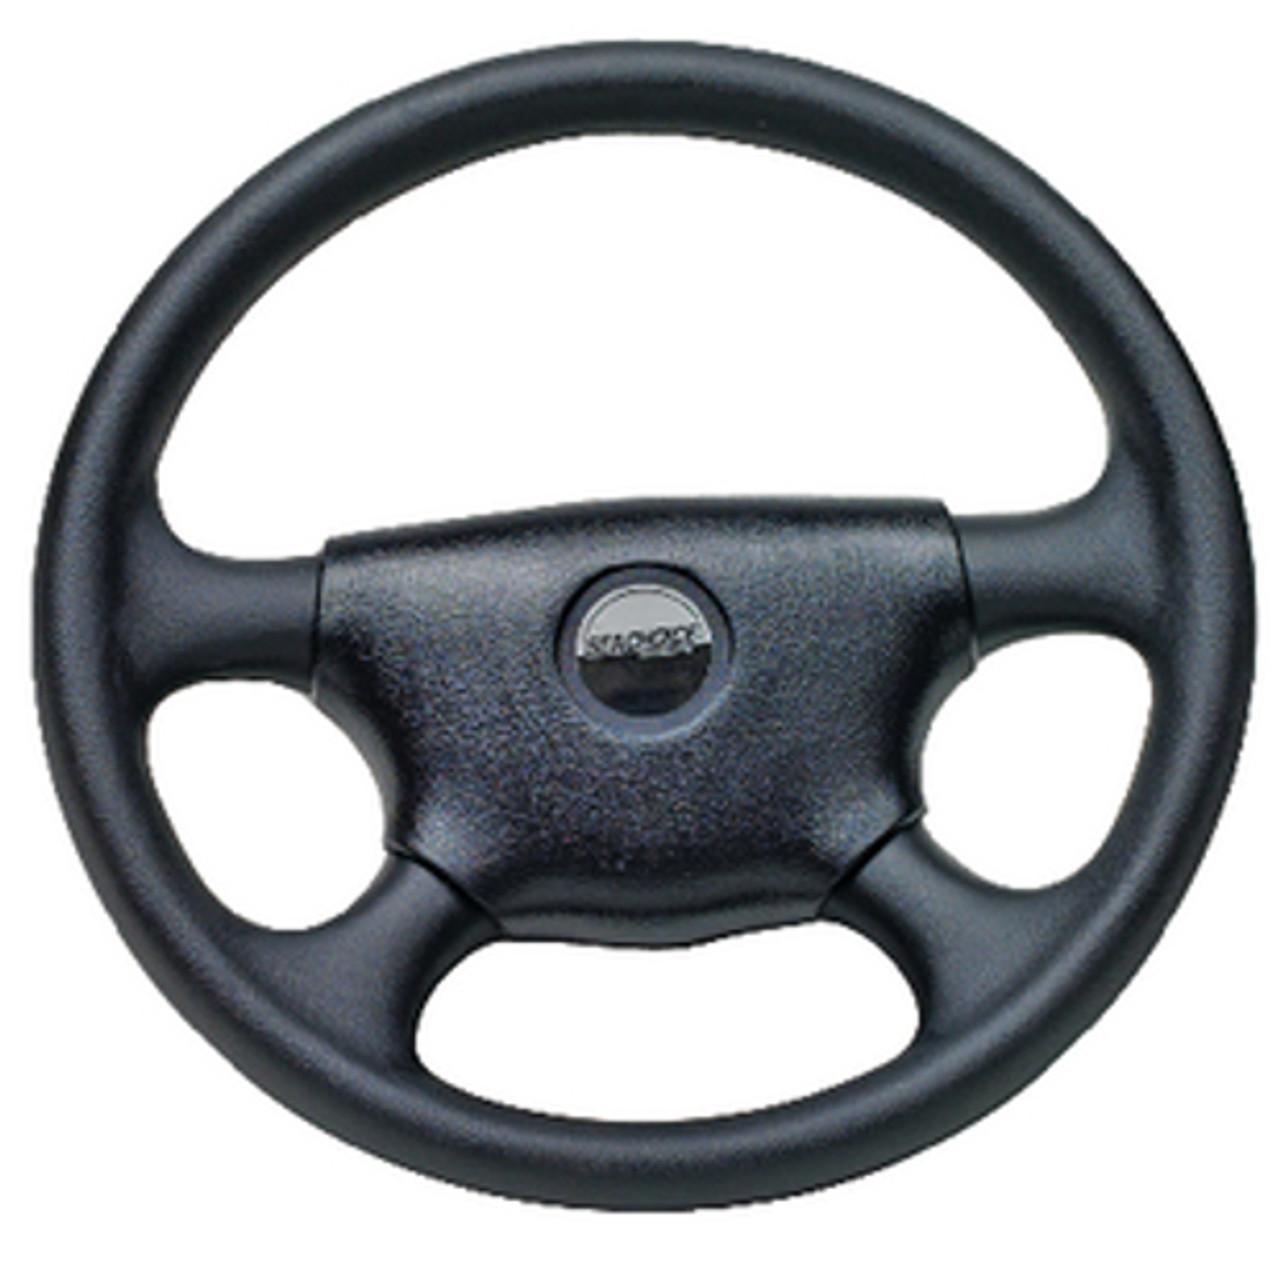 13-1/2 Inch Diameter Black Plastic 4 Spoke Steering Wheel for Boats